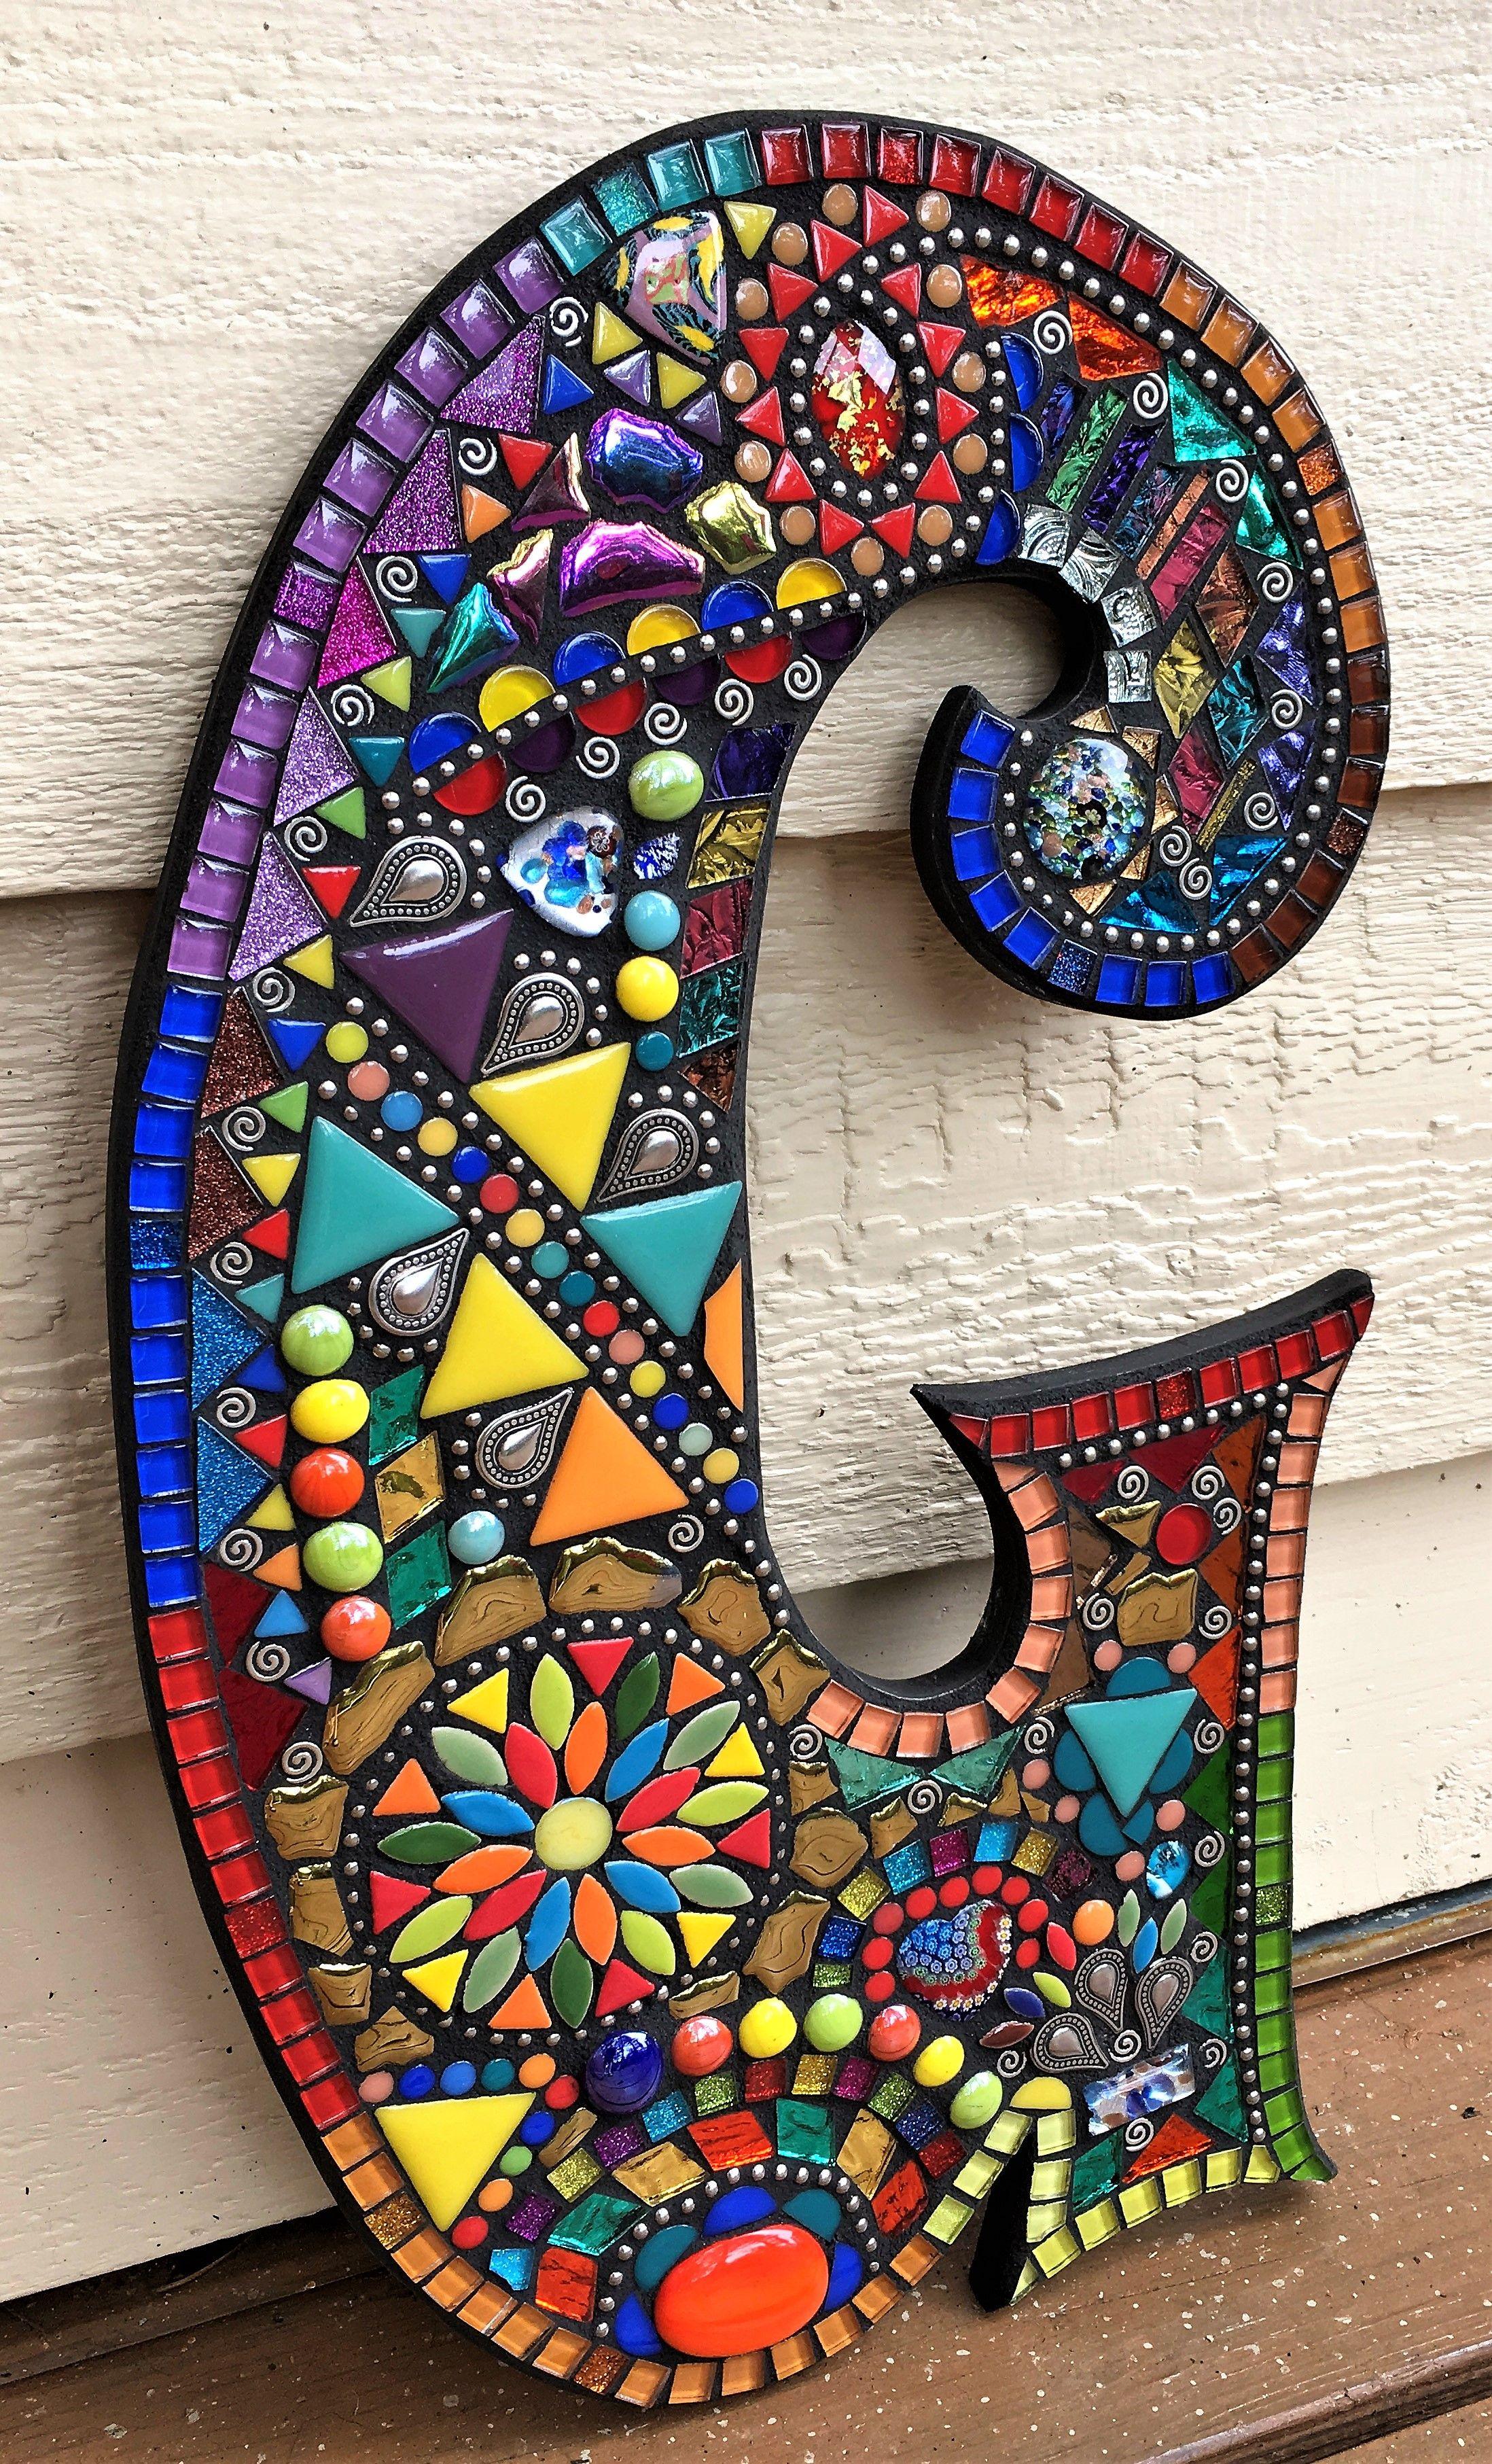 Custom Mosaic Letters By Tina Wise Crackin Mosaics Mosaic Art